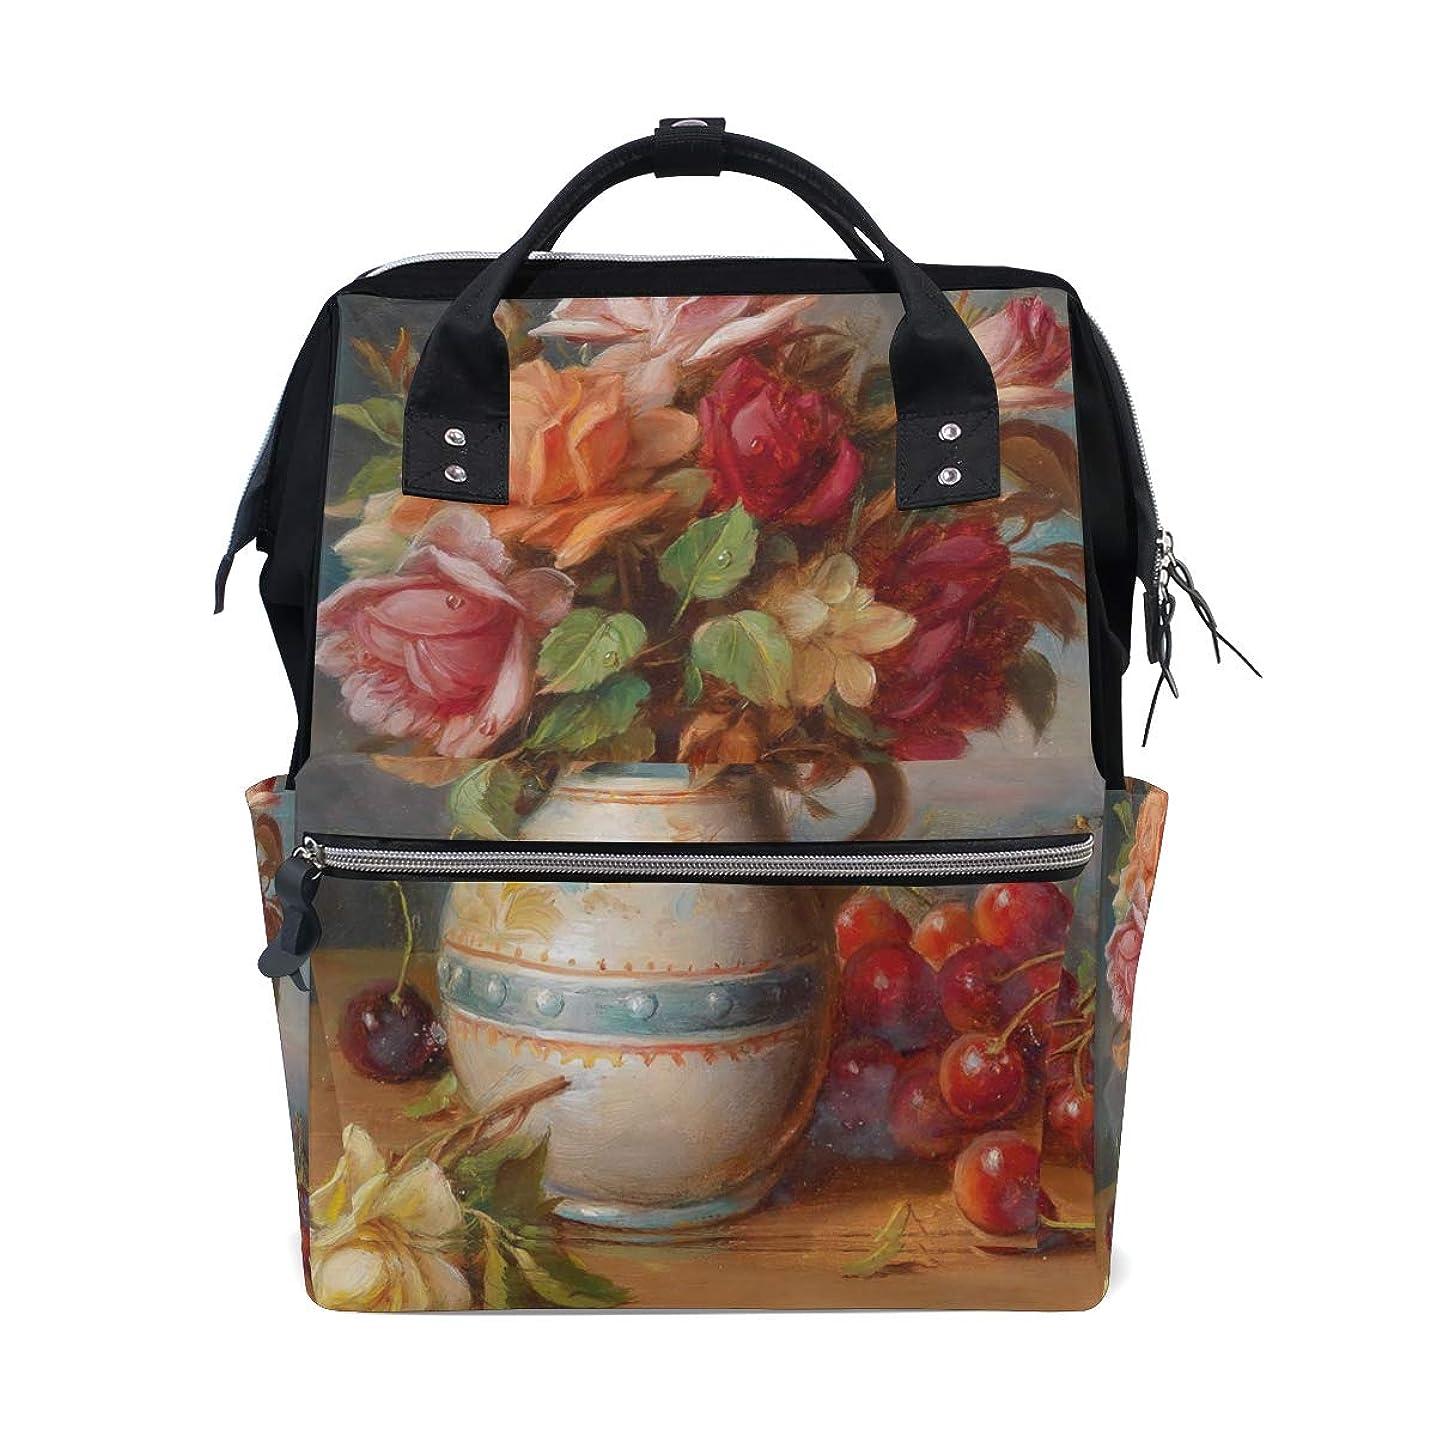 Oil Painting Rose Flowers Cherry School Backpack Large Capacity Mummy Bags Laptop Handbag Casual Travel Rucksack Satchel For Women Men Adult Teen Children